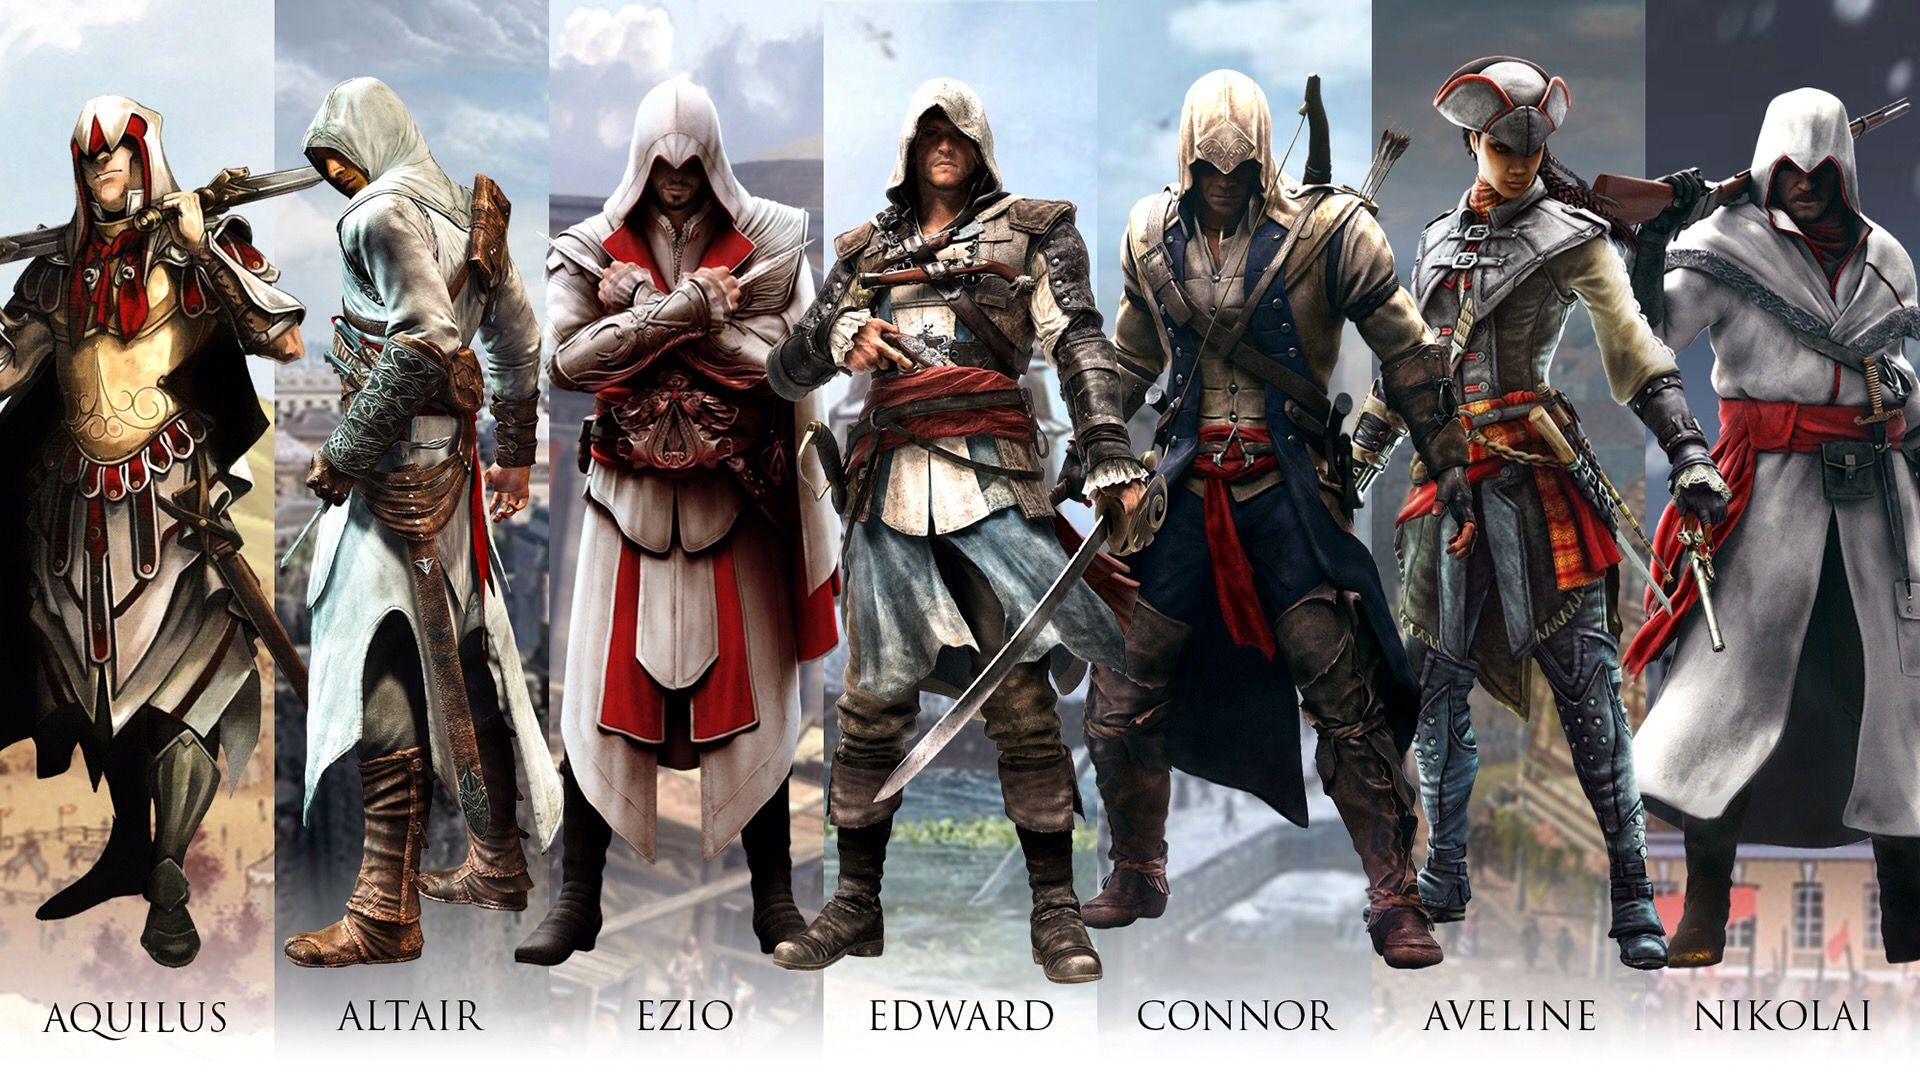 Распродажа игр серии Assassin's Creed: 15+ игр со скидками